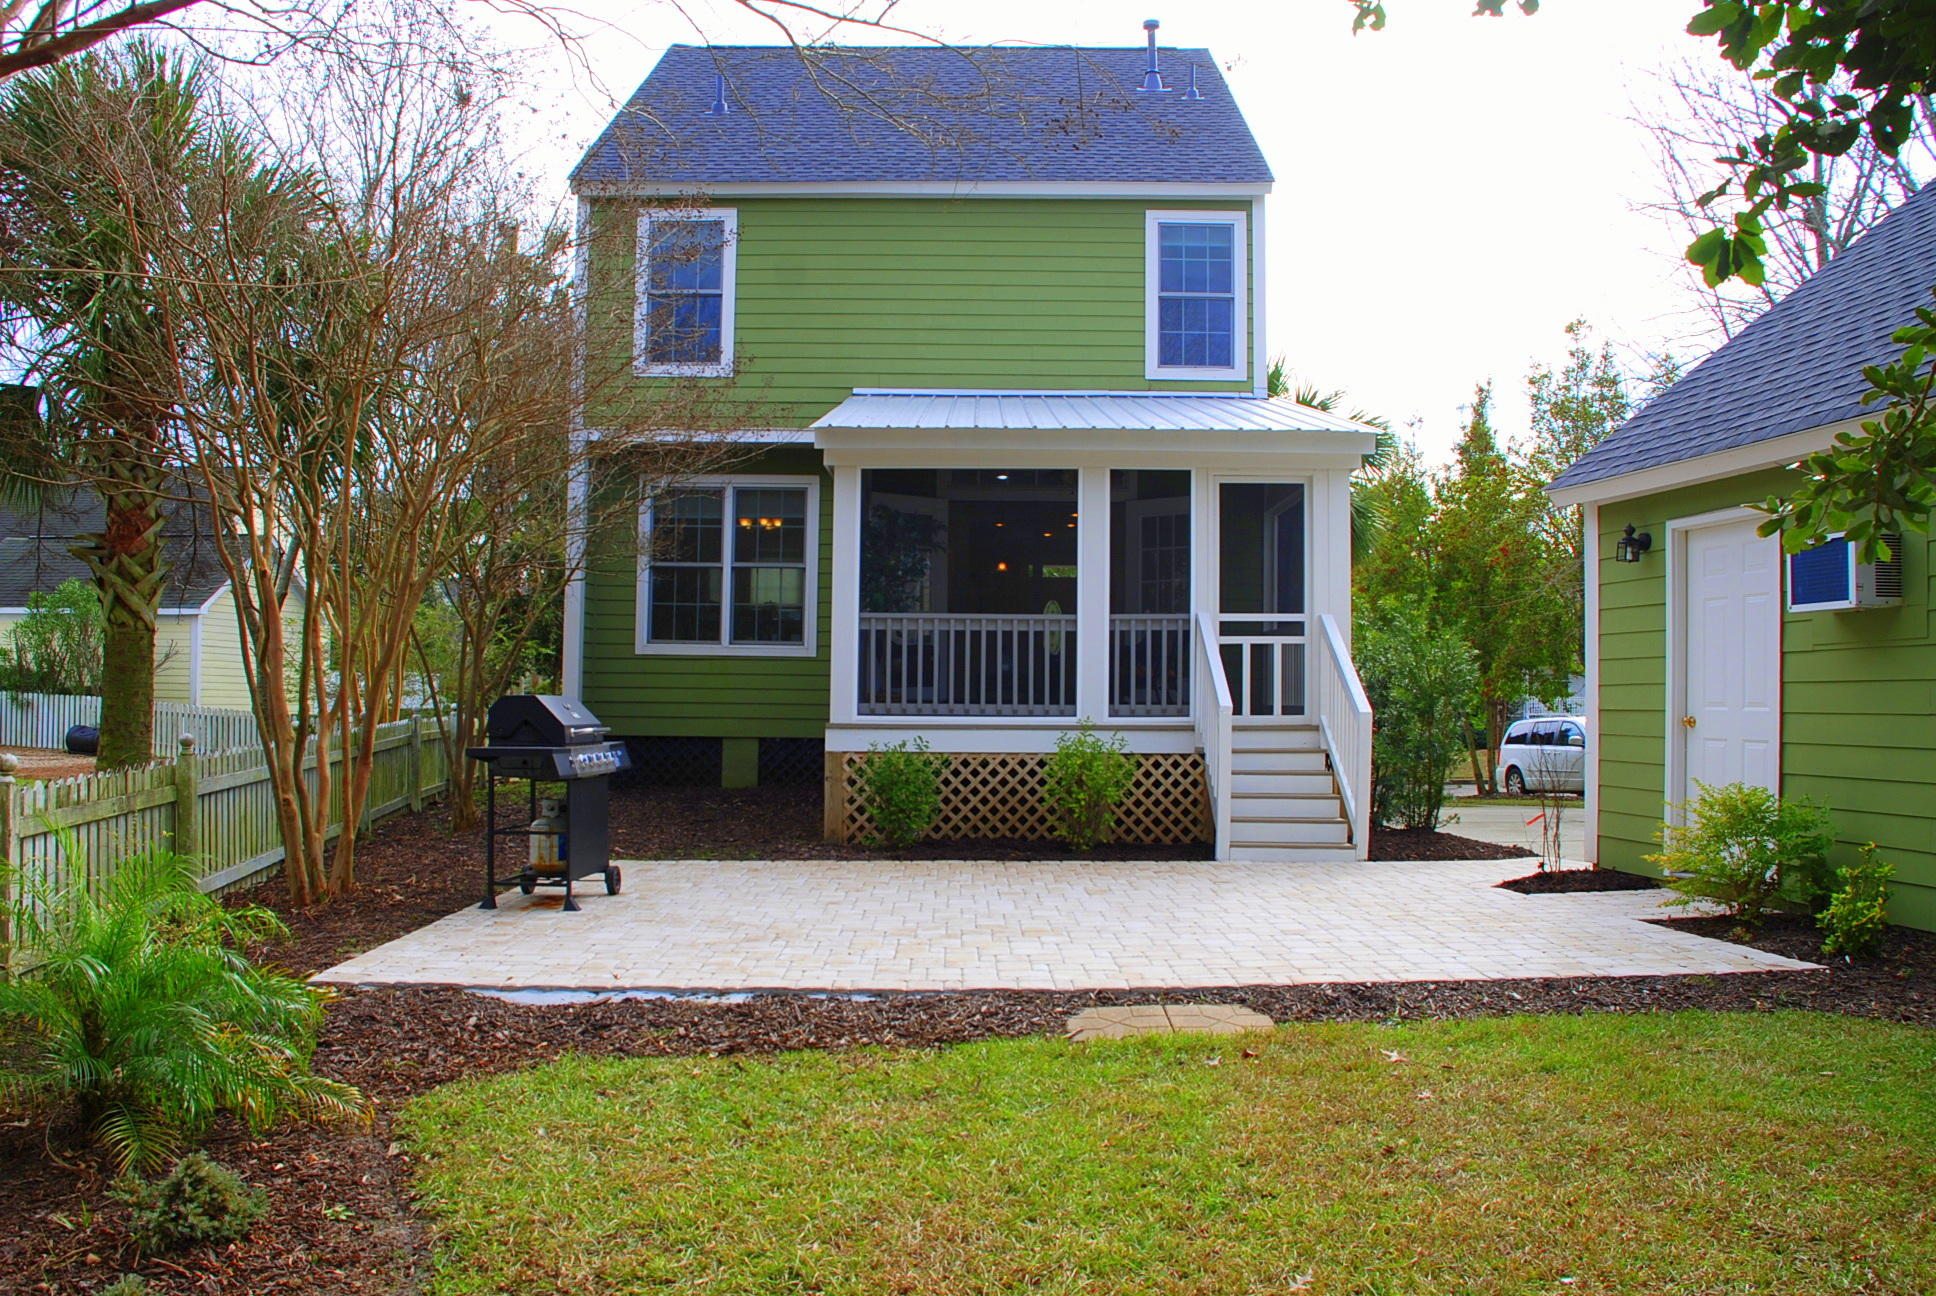 Daniel Island Homes For Sale - 100 Jordan, Daniel Island, SC - 24